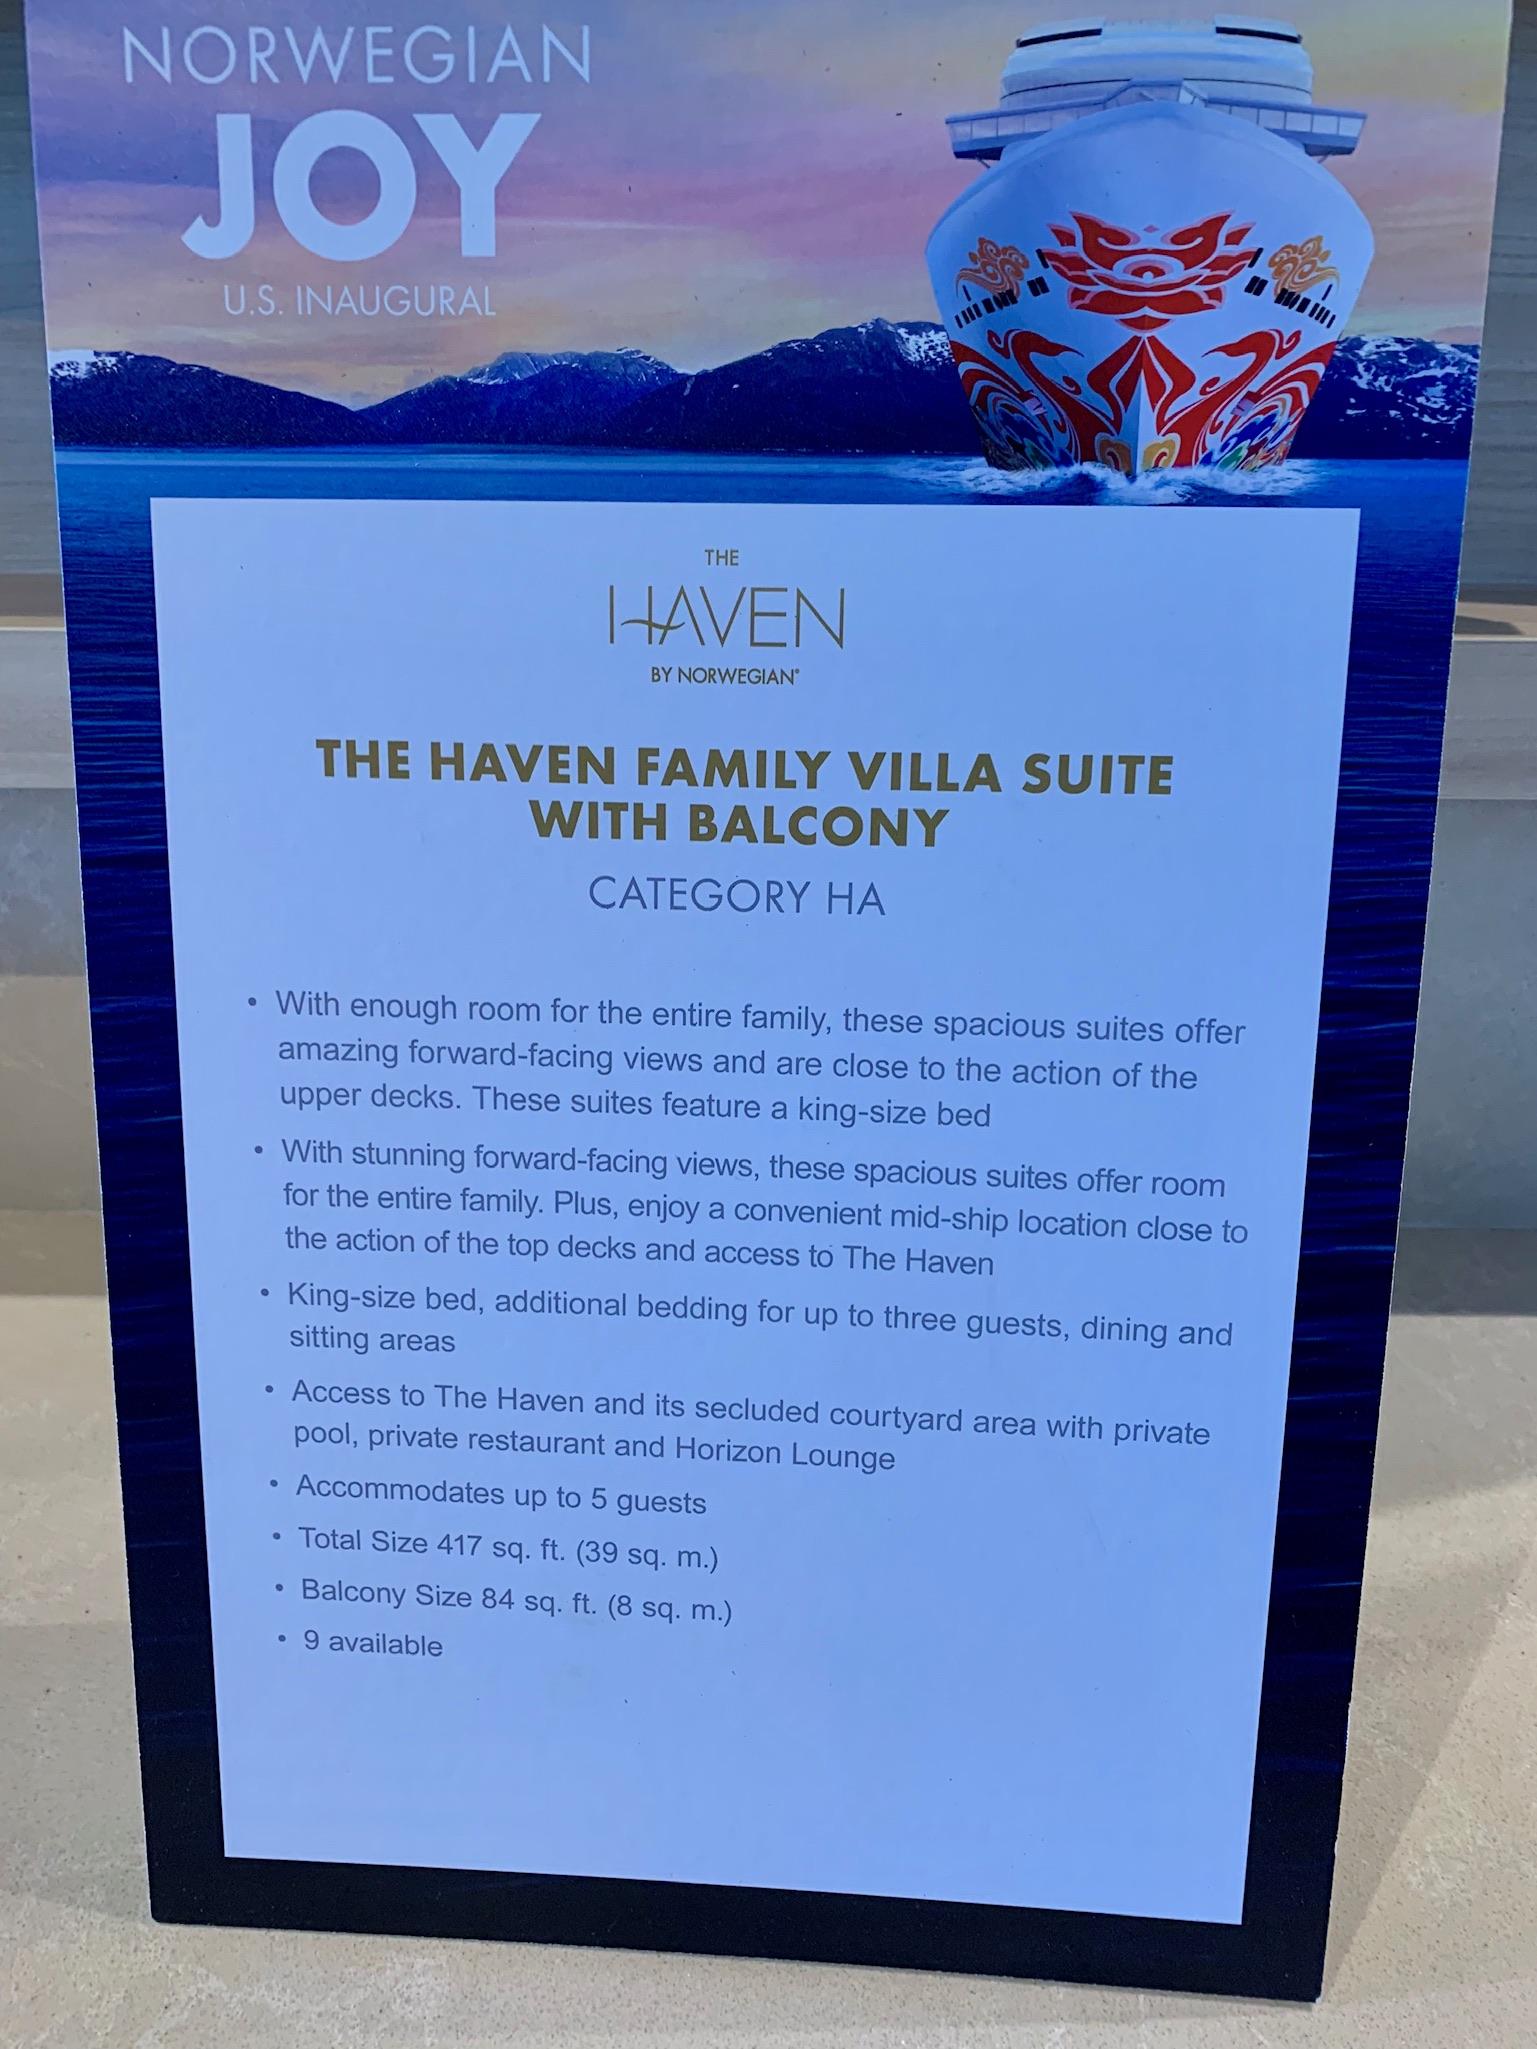 NCL Joy - Rooms - Haven Family Villa Suite.jpg